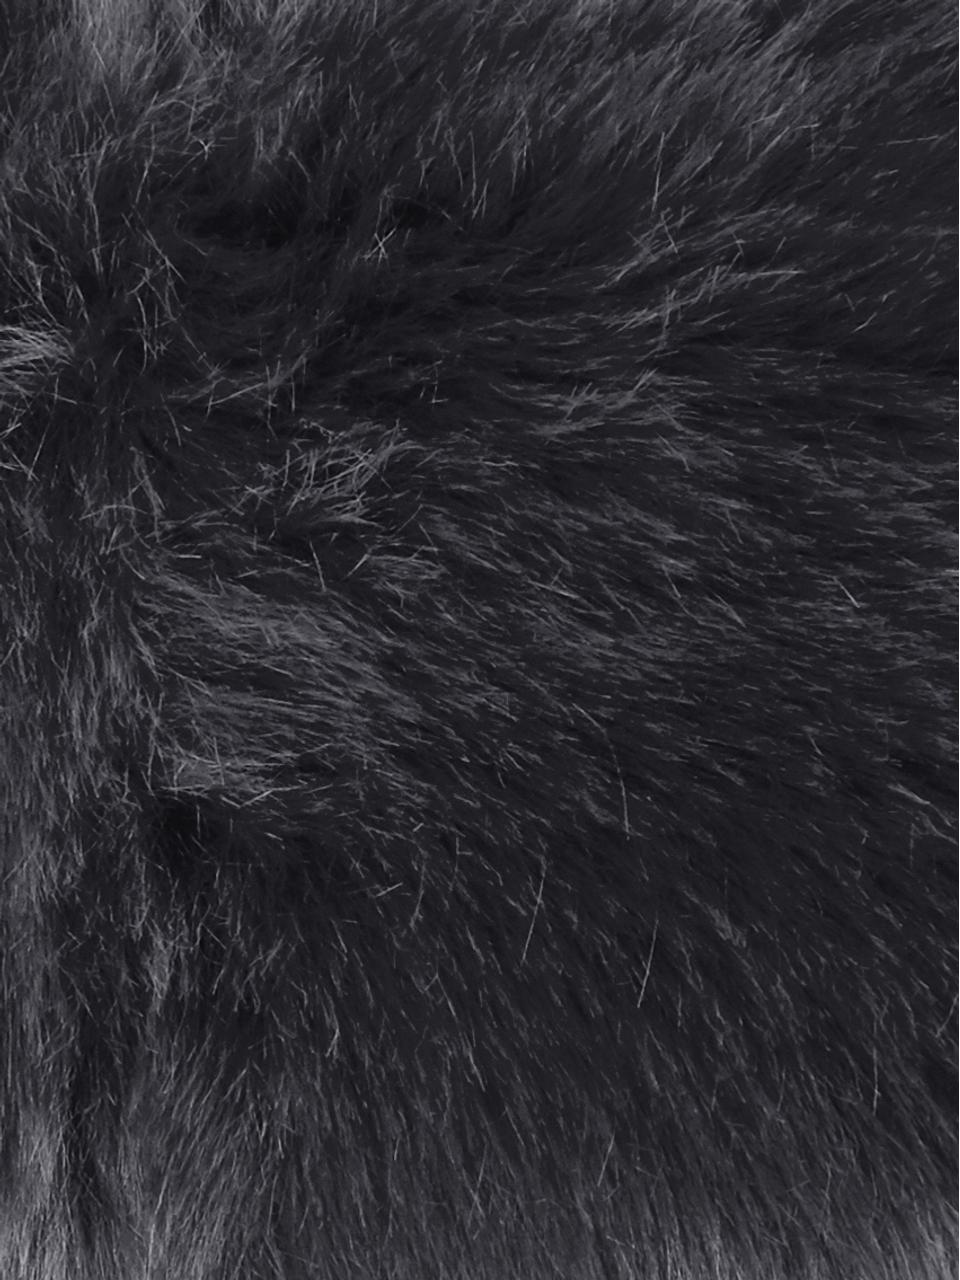 Flauschige Kunstfell-Kissenhülle Mathilde in Dunkelgrau, glatt, Vorderseite: 67% Akryl, 33% Polyester, Rückseite: 100% Polyester, Dunkelgrau, 30 x 50 cm